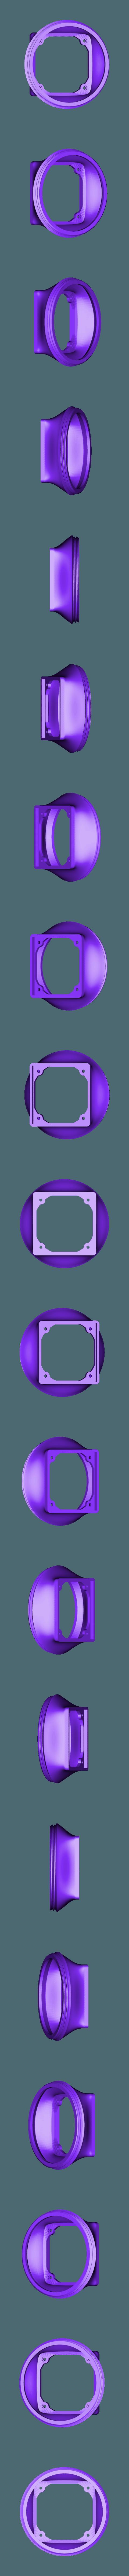 AST-CharcoalChamberToFan.stl Download free STL file HEPA Air Filter Scrubber Tower • 3D print design, DuaneIndeed